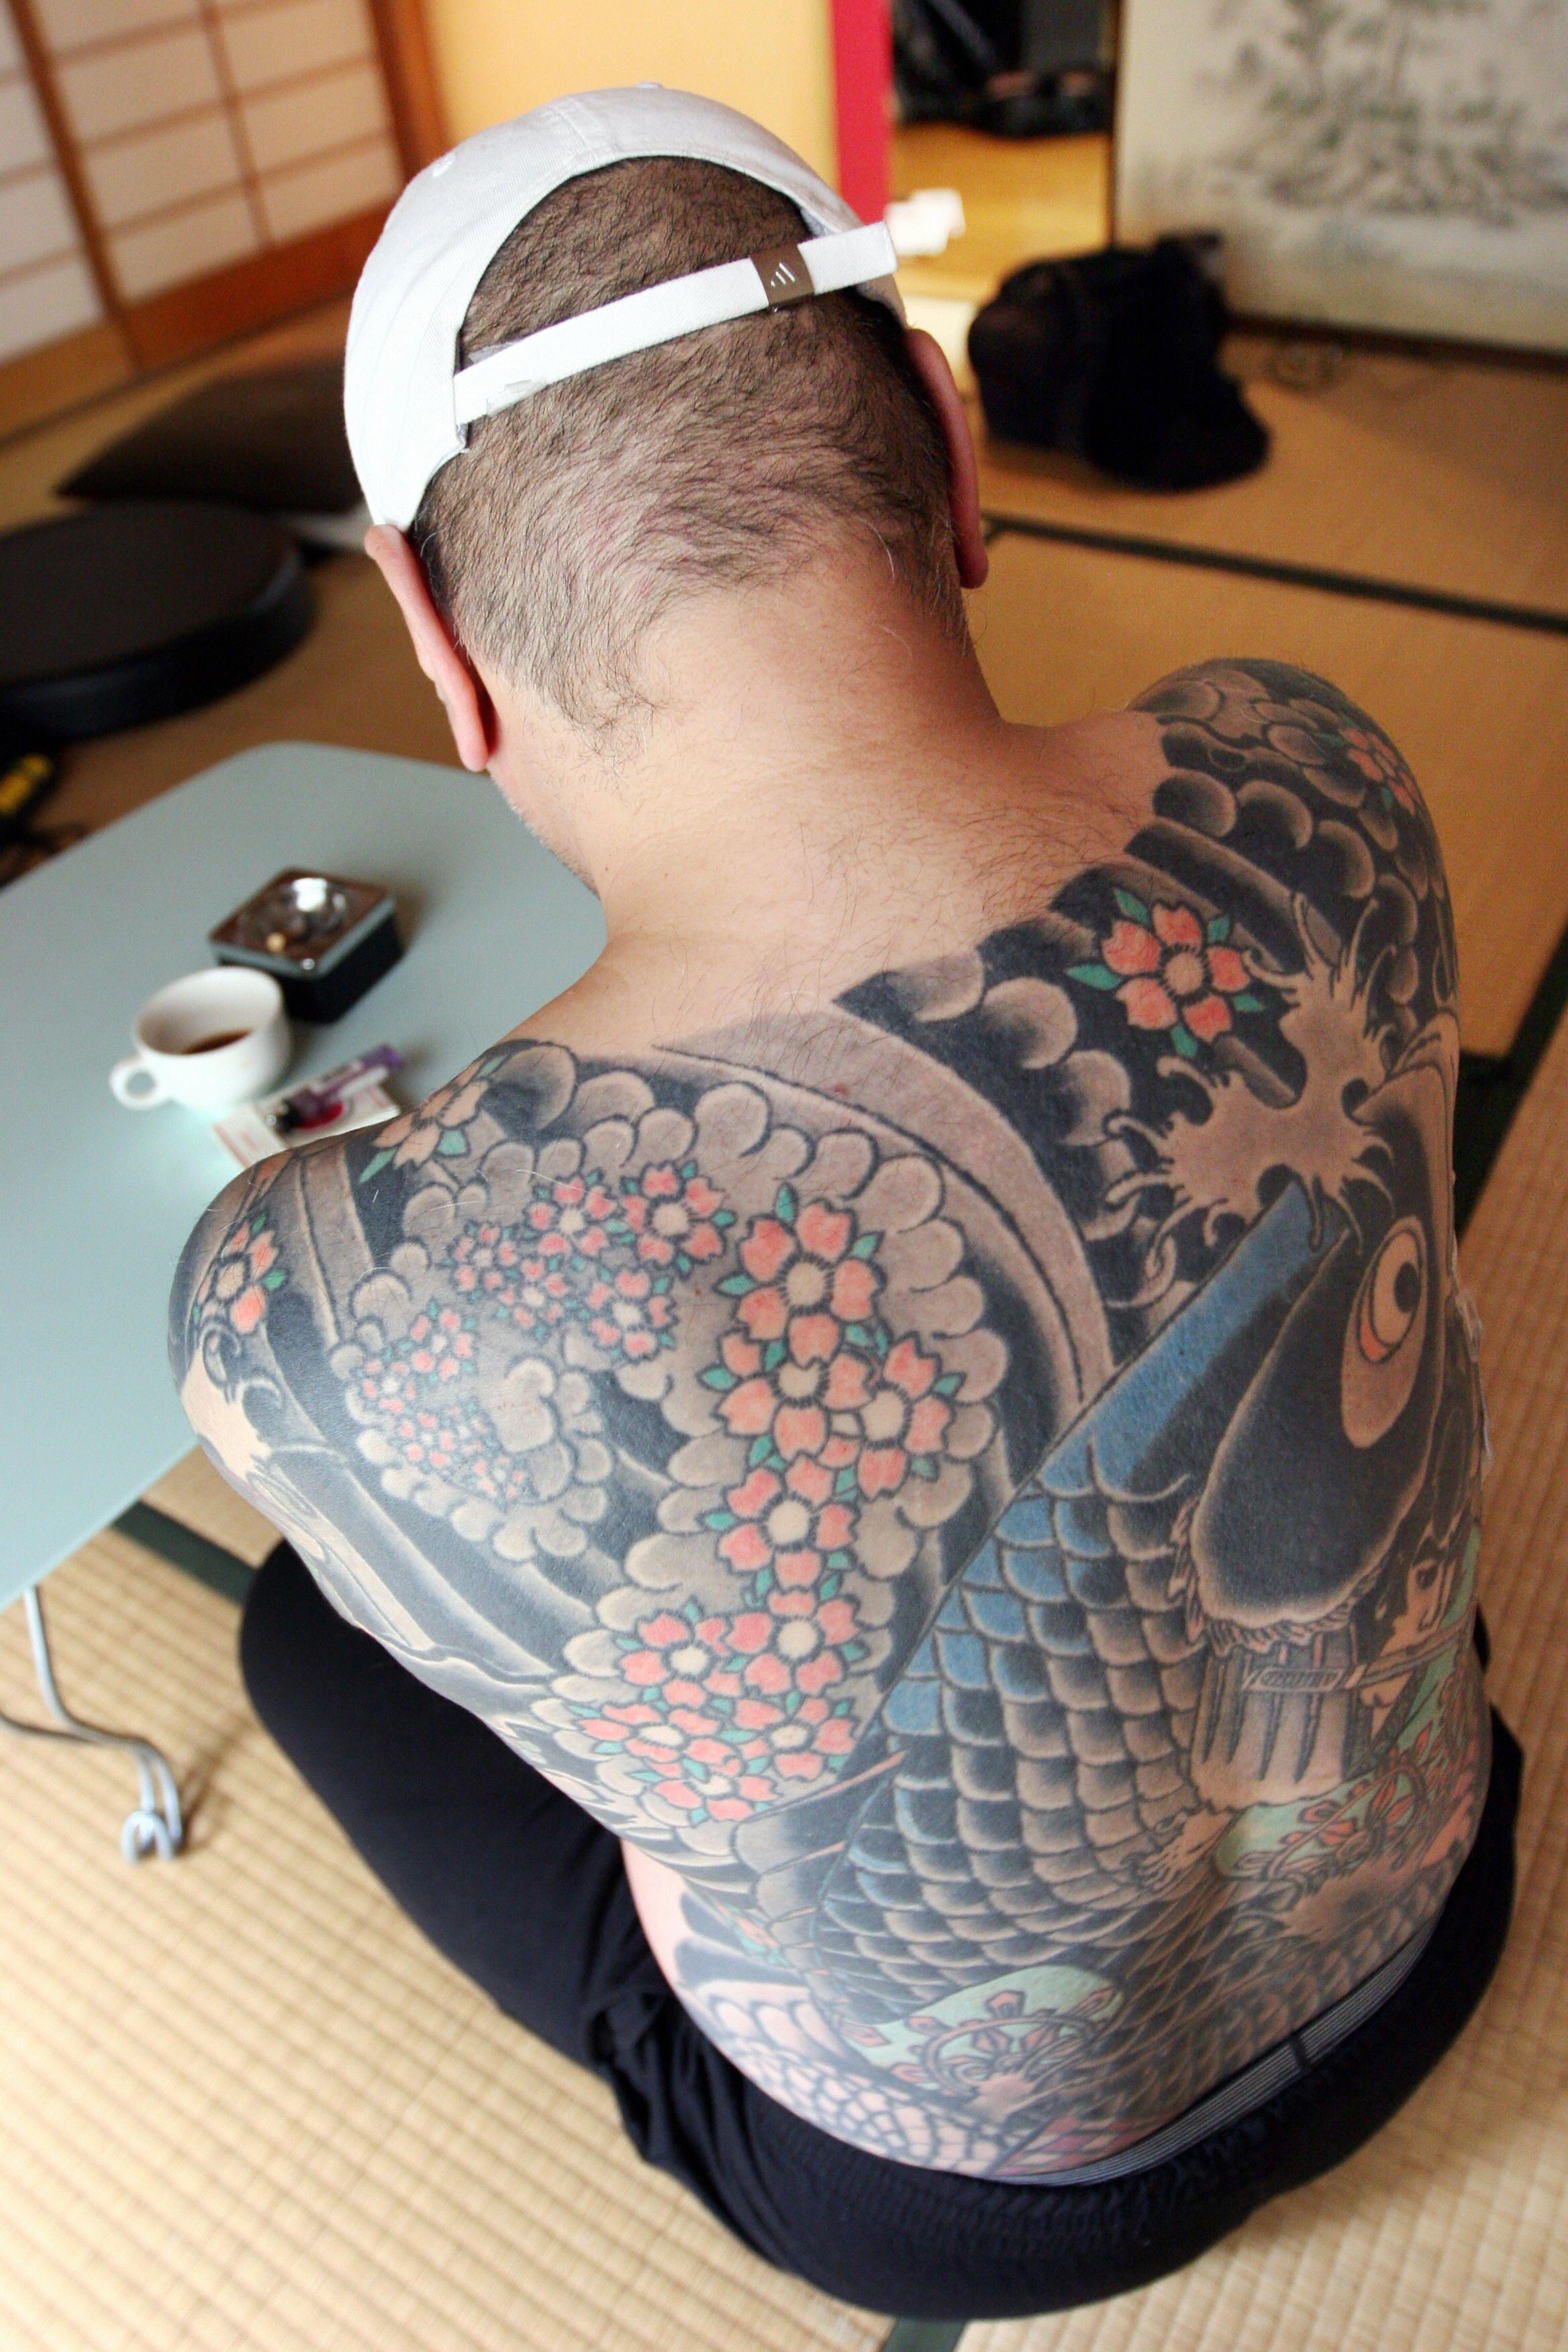 Man Yakuza Cigar Tattoo: Japanese Yakuza Boss Caught After Tattooed Photos Go Viral